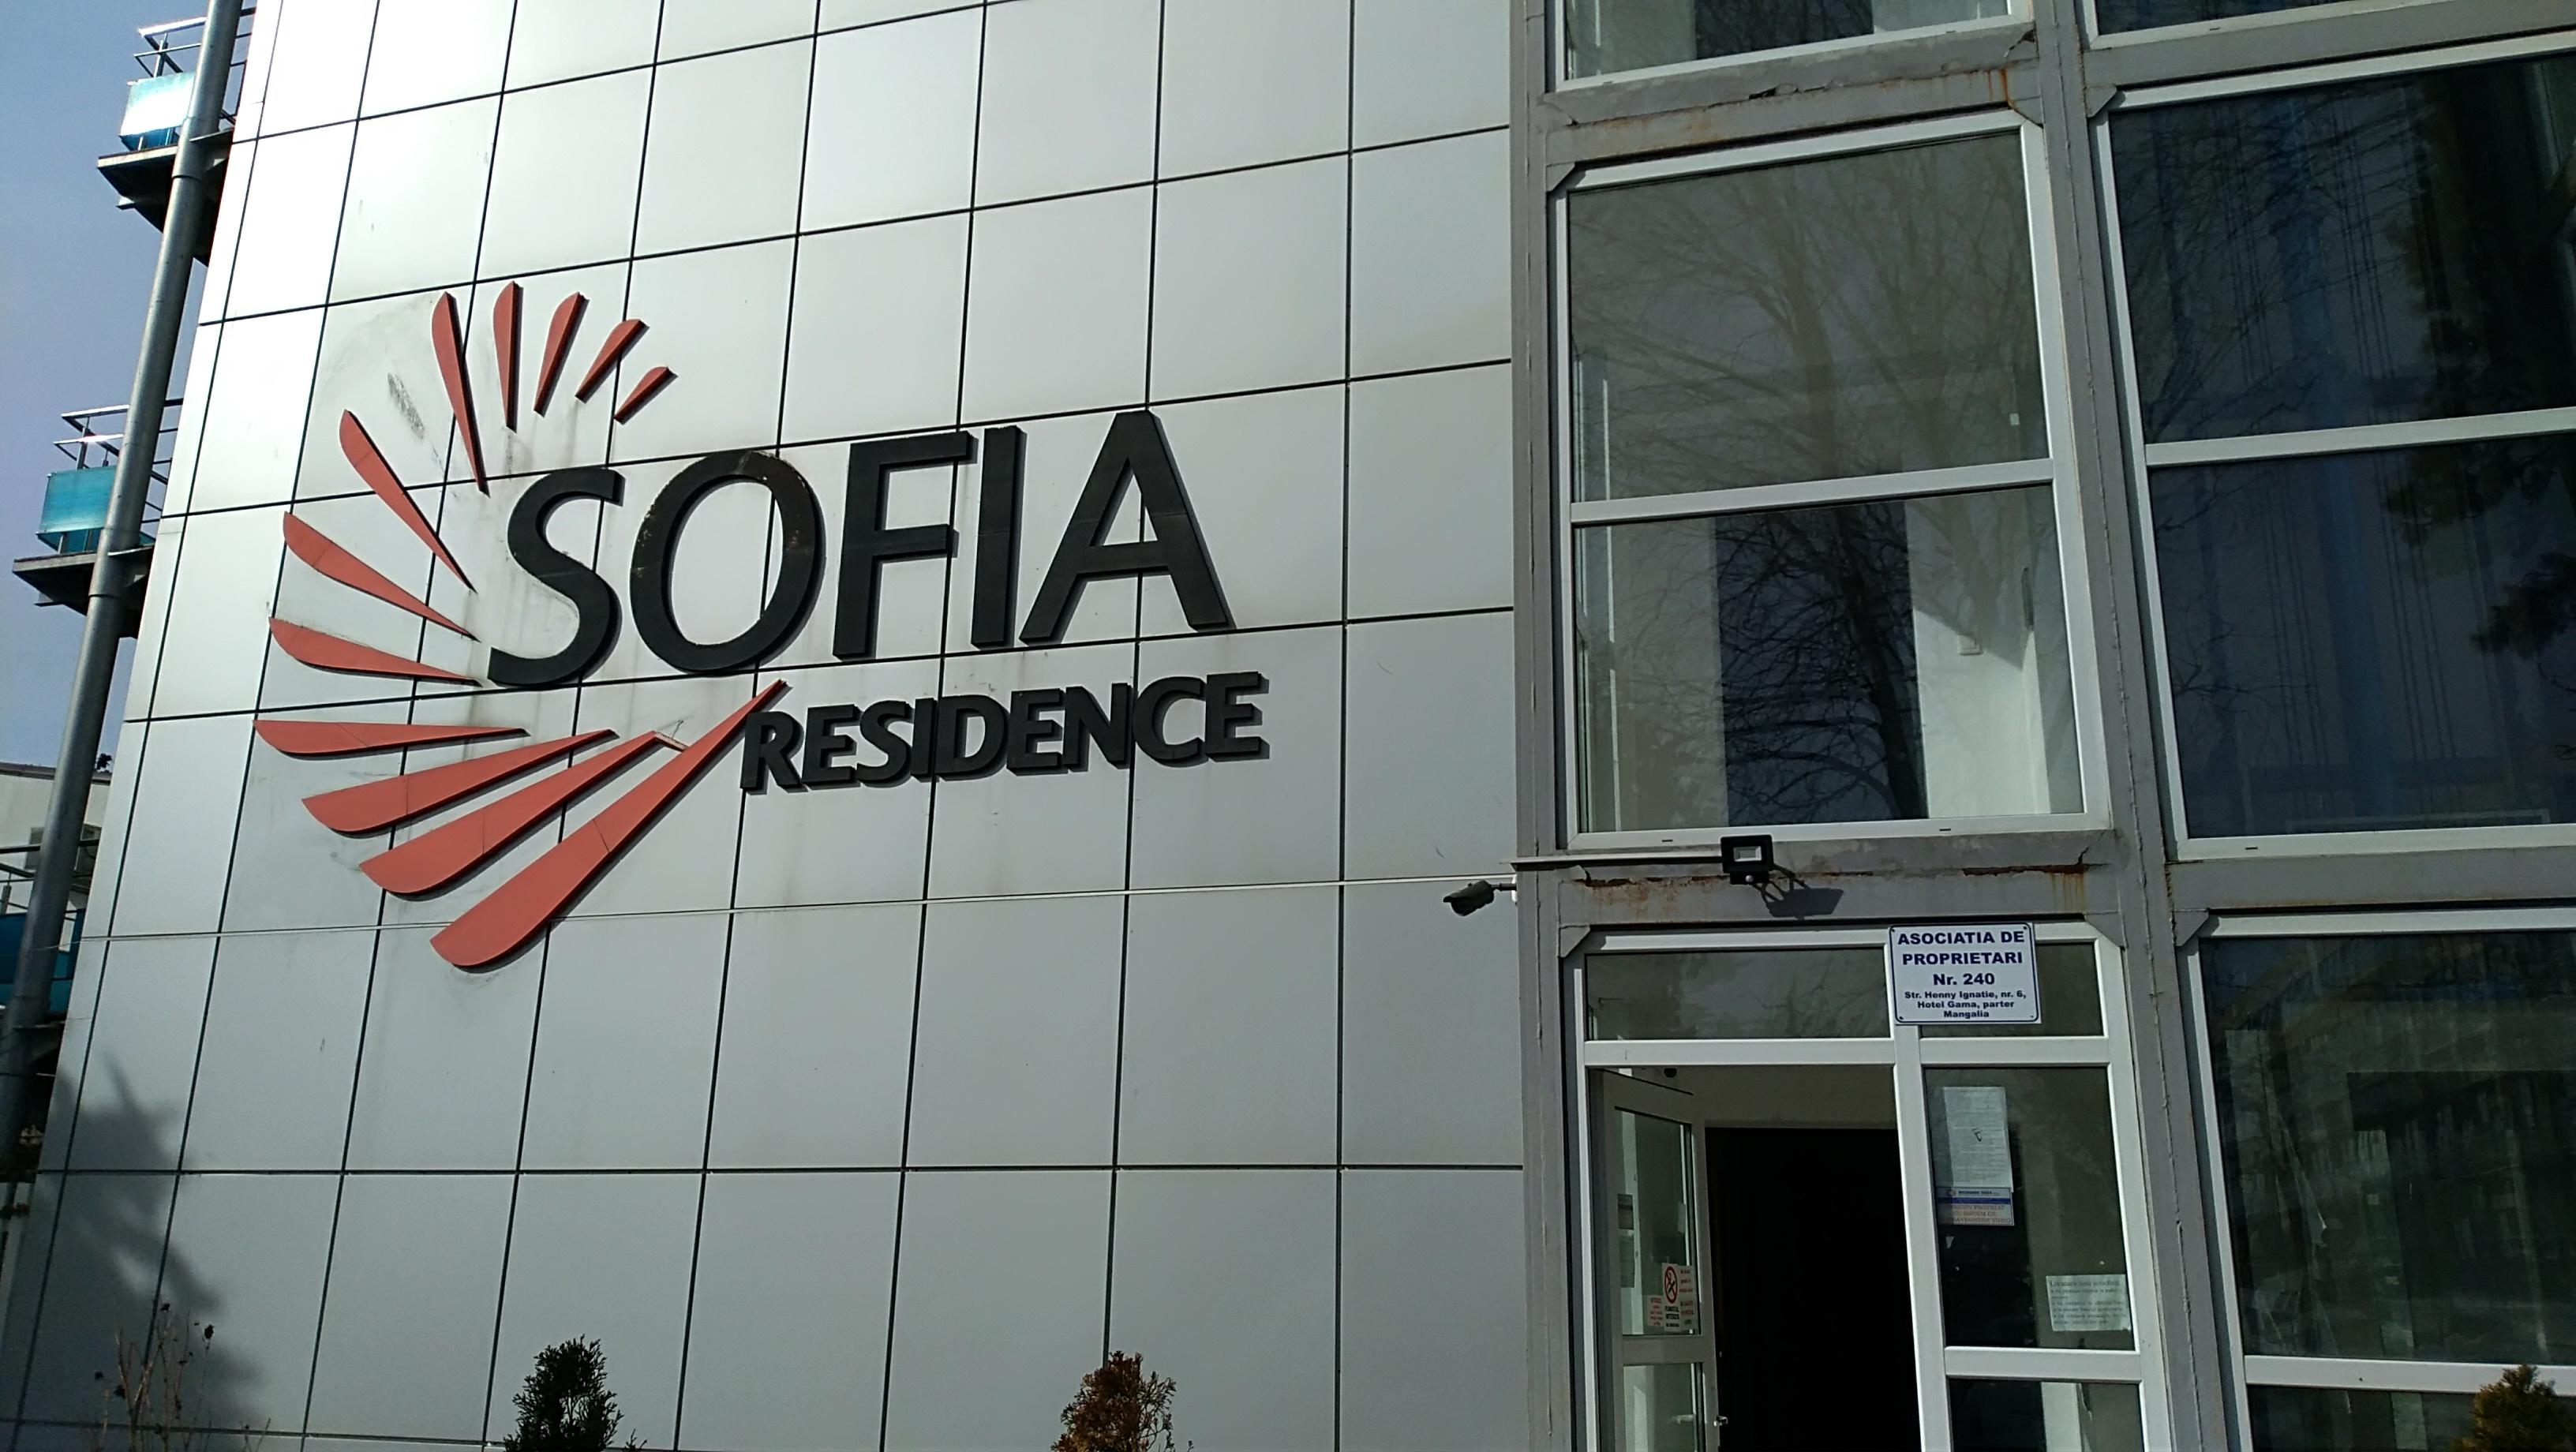 Apartament 2 camere, Nr. 164, situat în Saturn, jud. Constanța